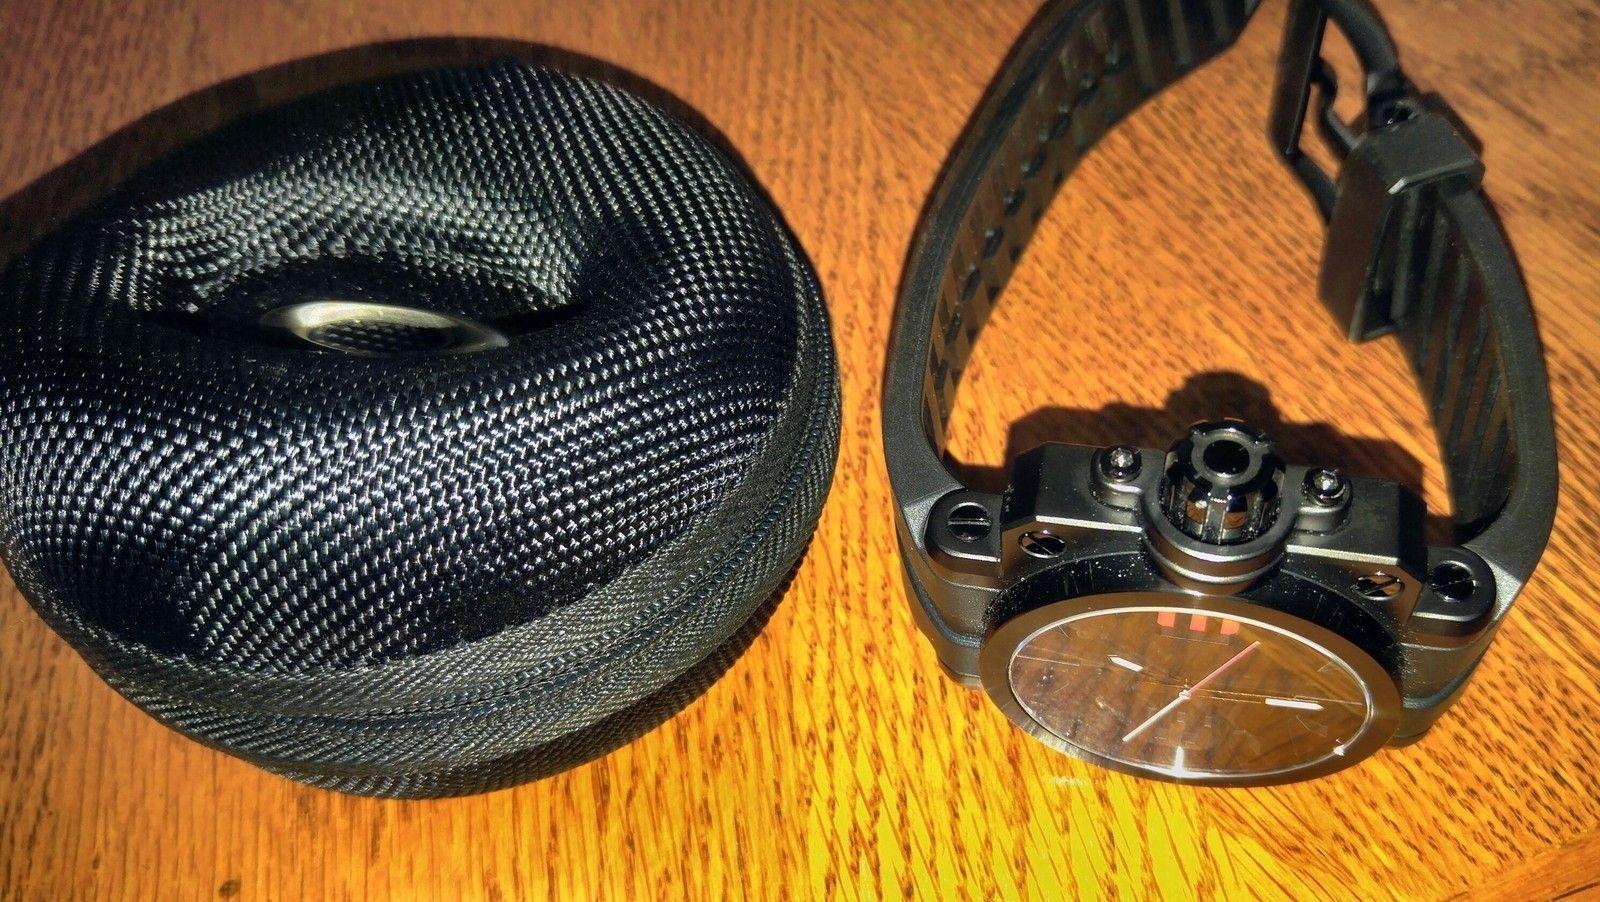 Stealth gearbox - 20151230_190420-1.jpg